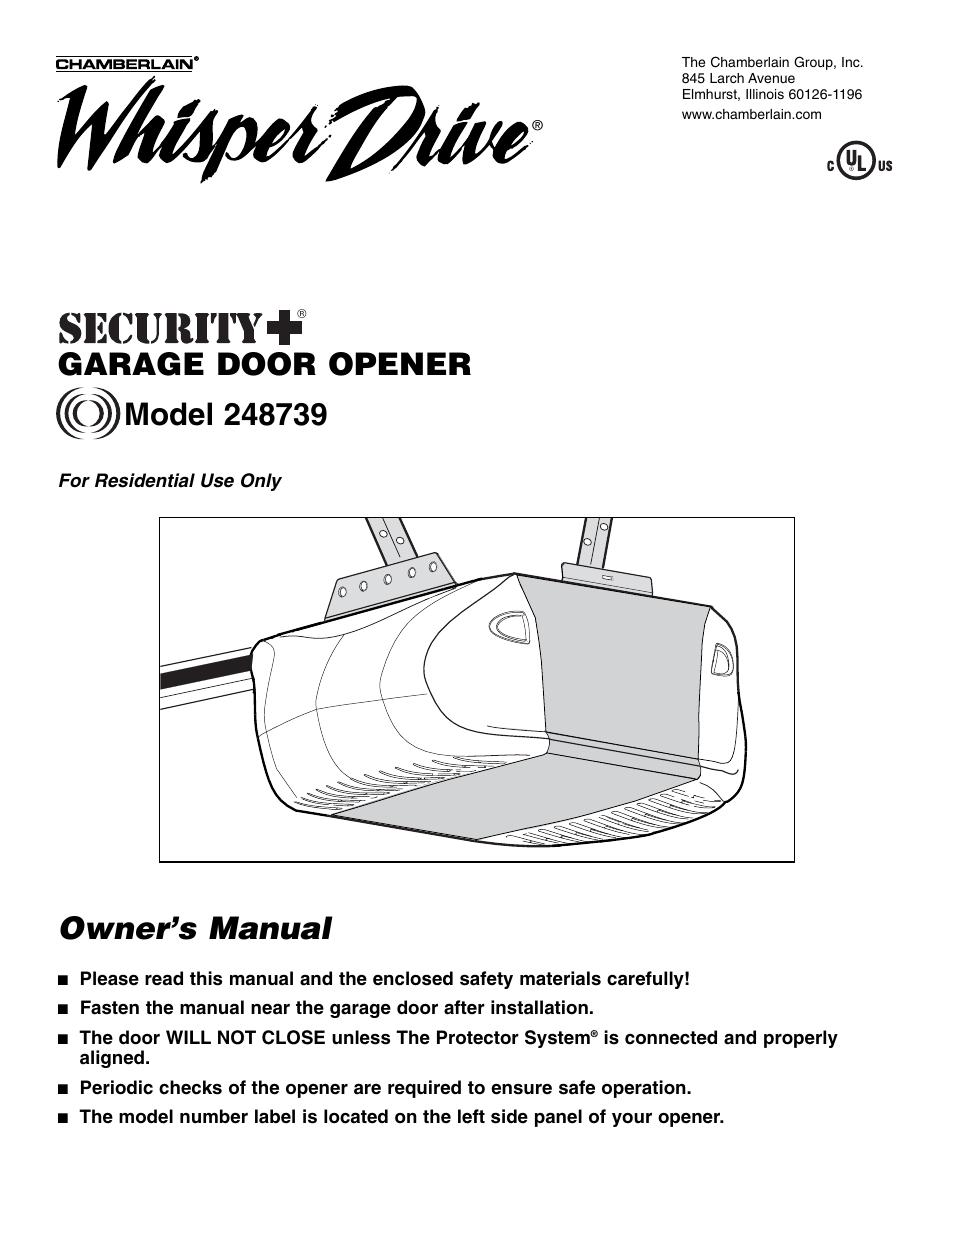 Chamberlain Whisper Drive Garage Door Opener Wiring Diagram Formula For Sensors 248739 User Manual 40 Pages Sensor